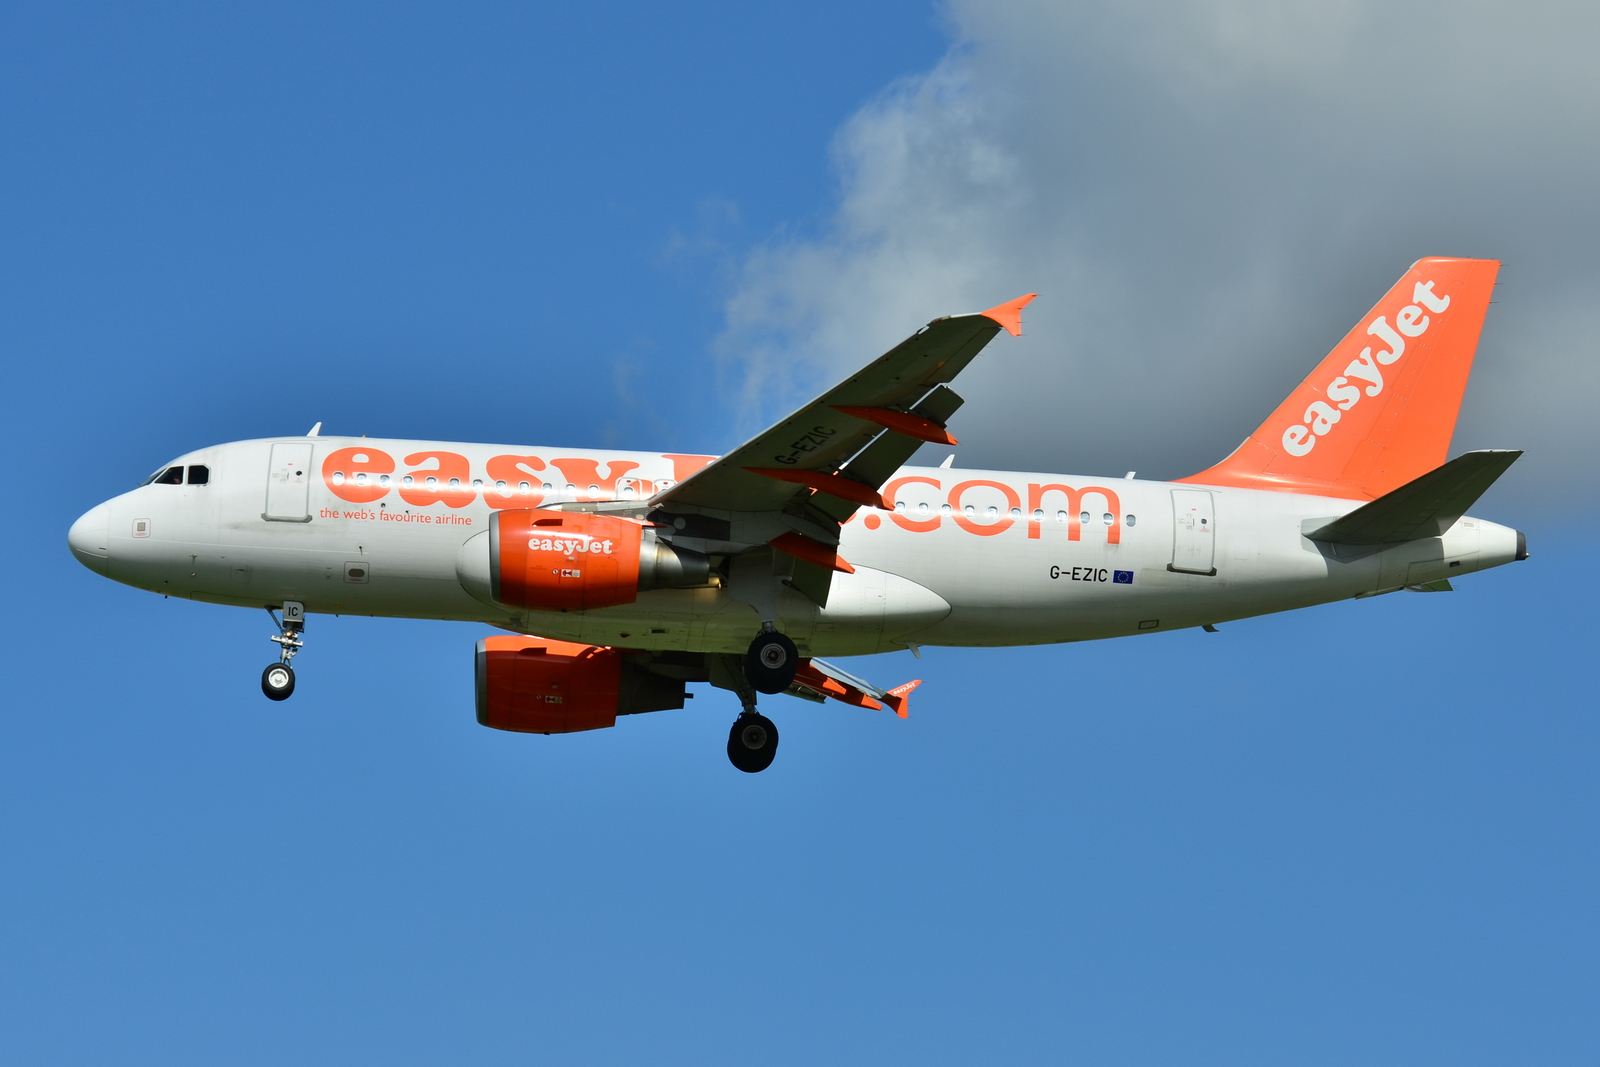 File:Airbus A319-100 easyJet (EZY) G-EZIC - MSN 2436